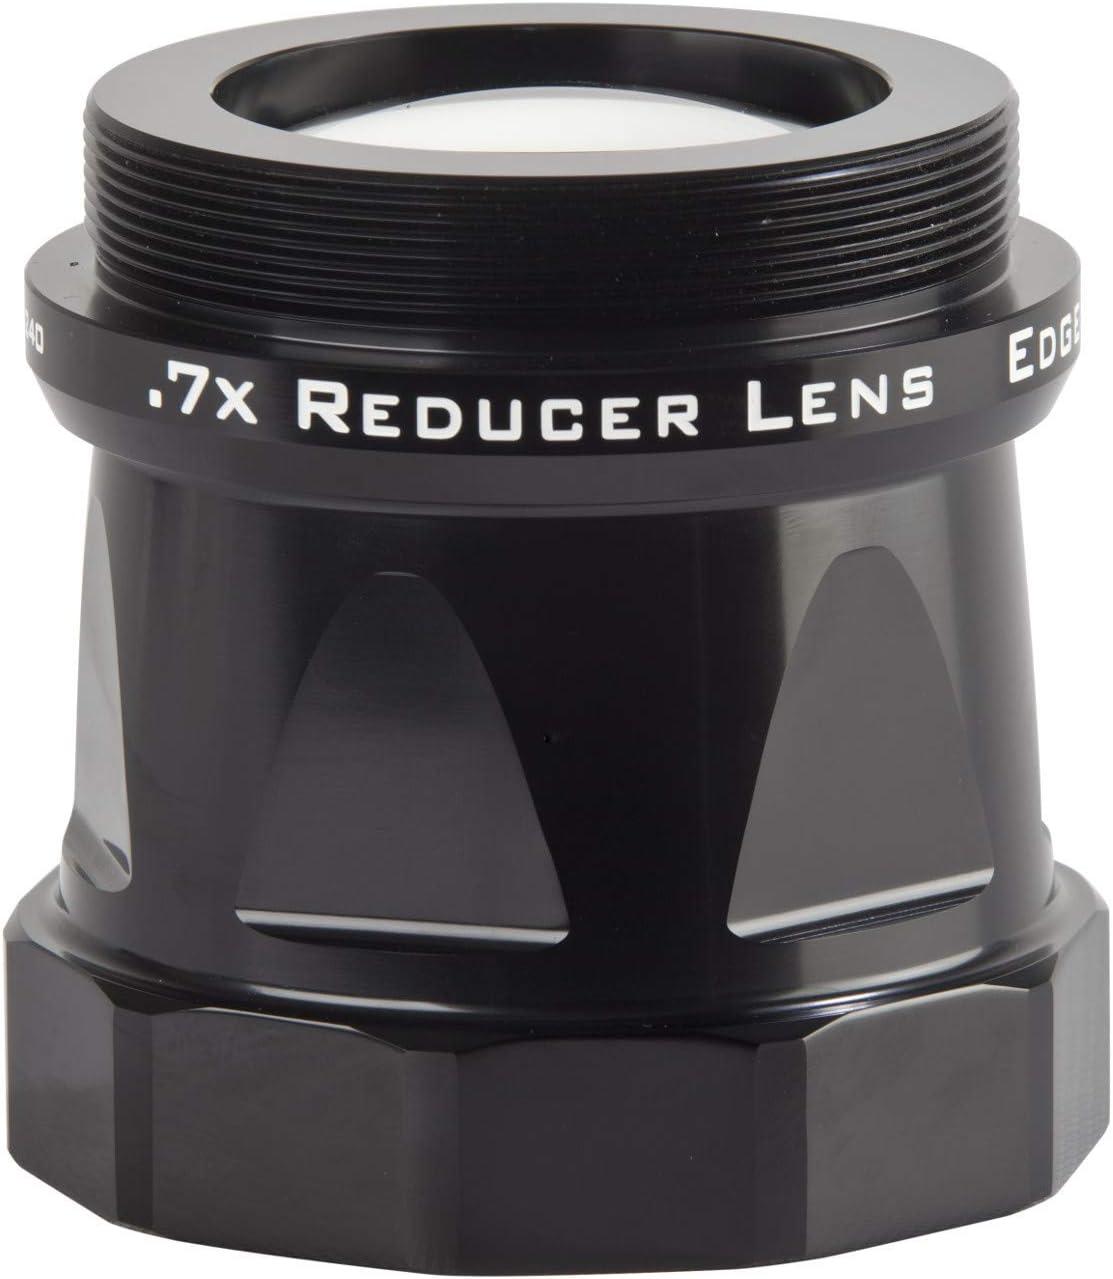 Celestron Reducer Lens .7X EdgeHD TM 1400